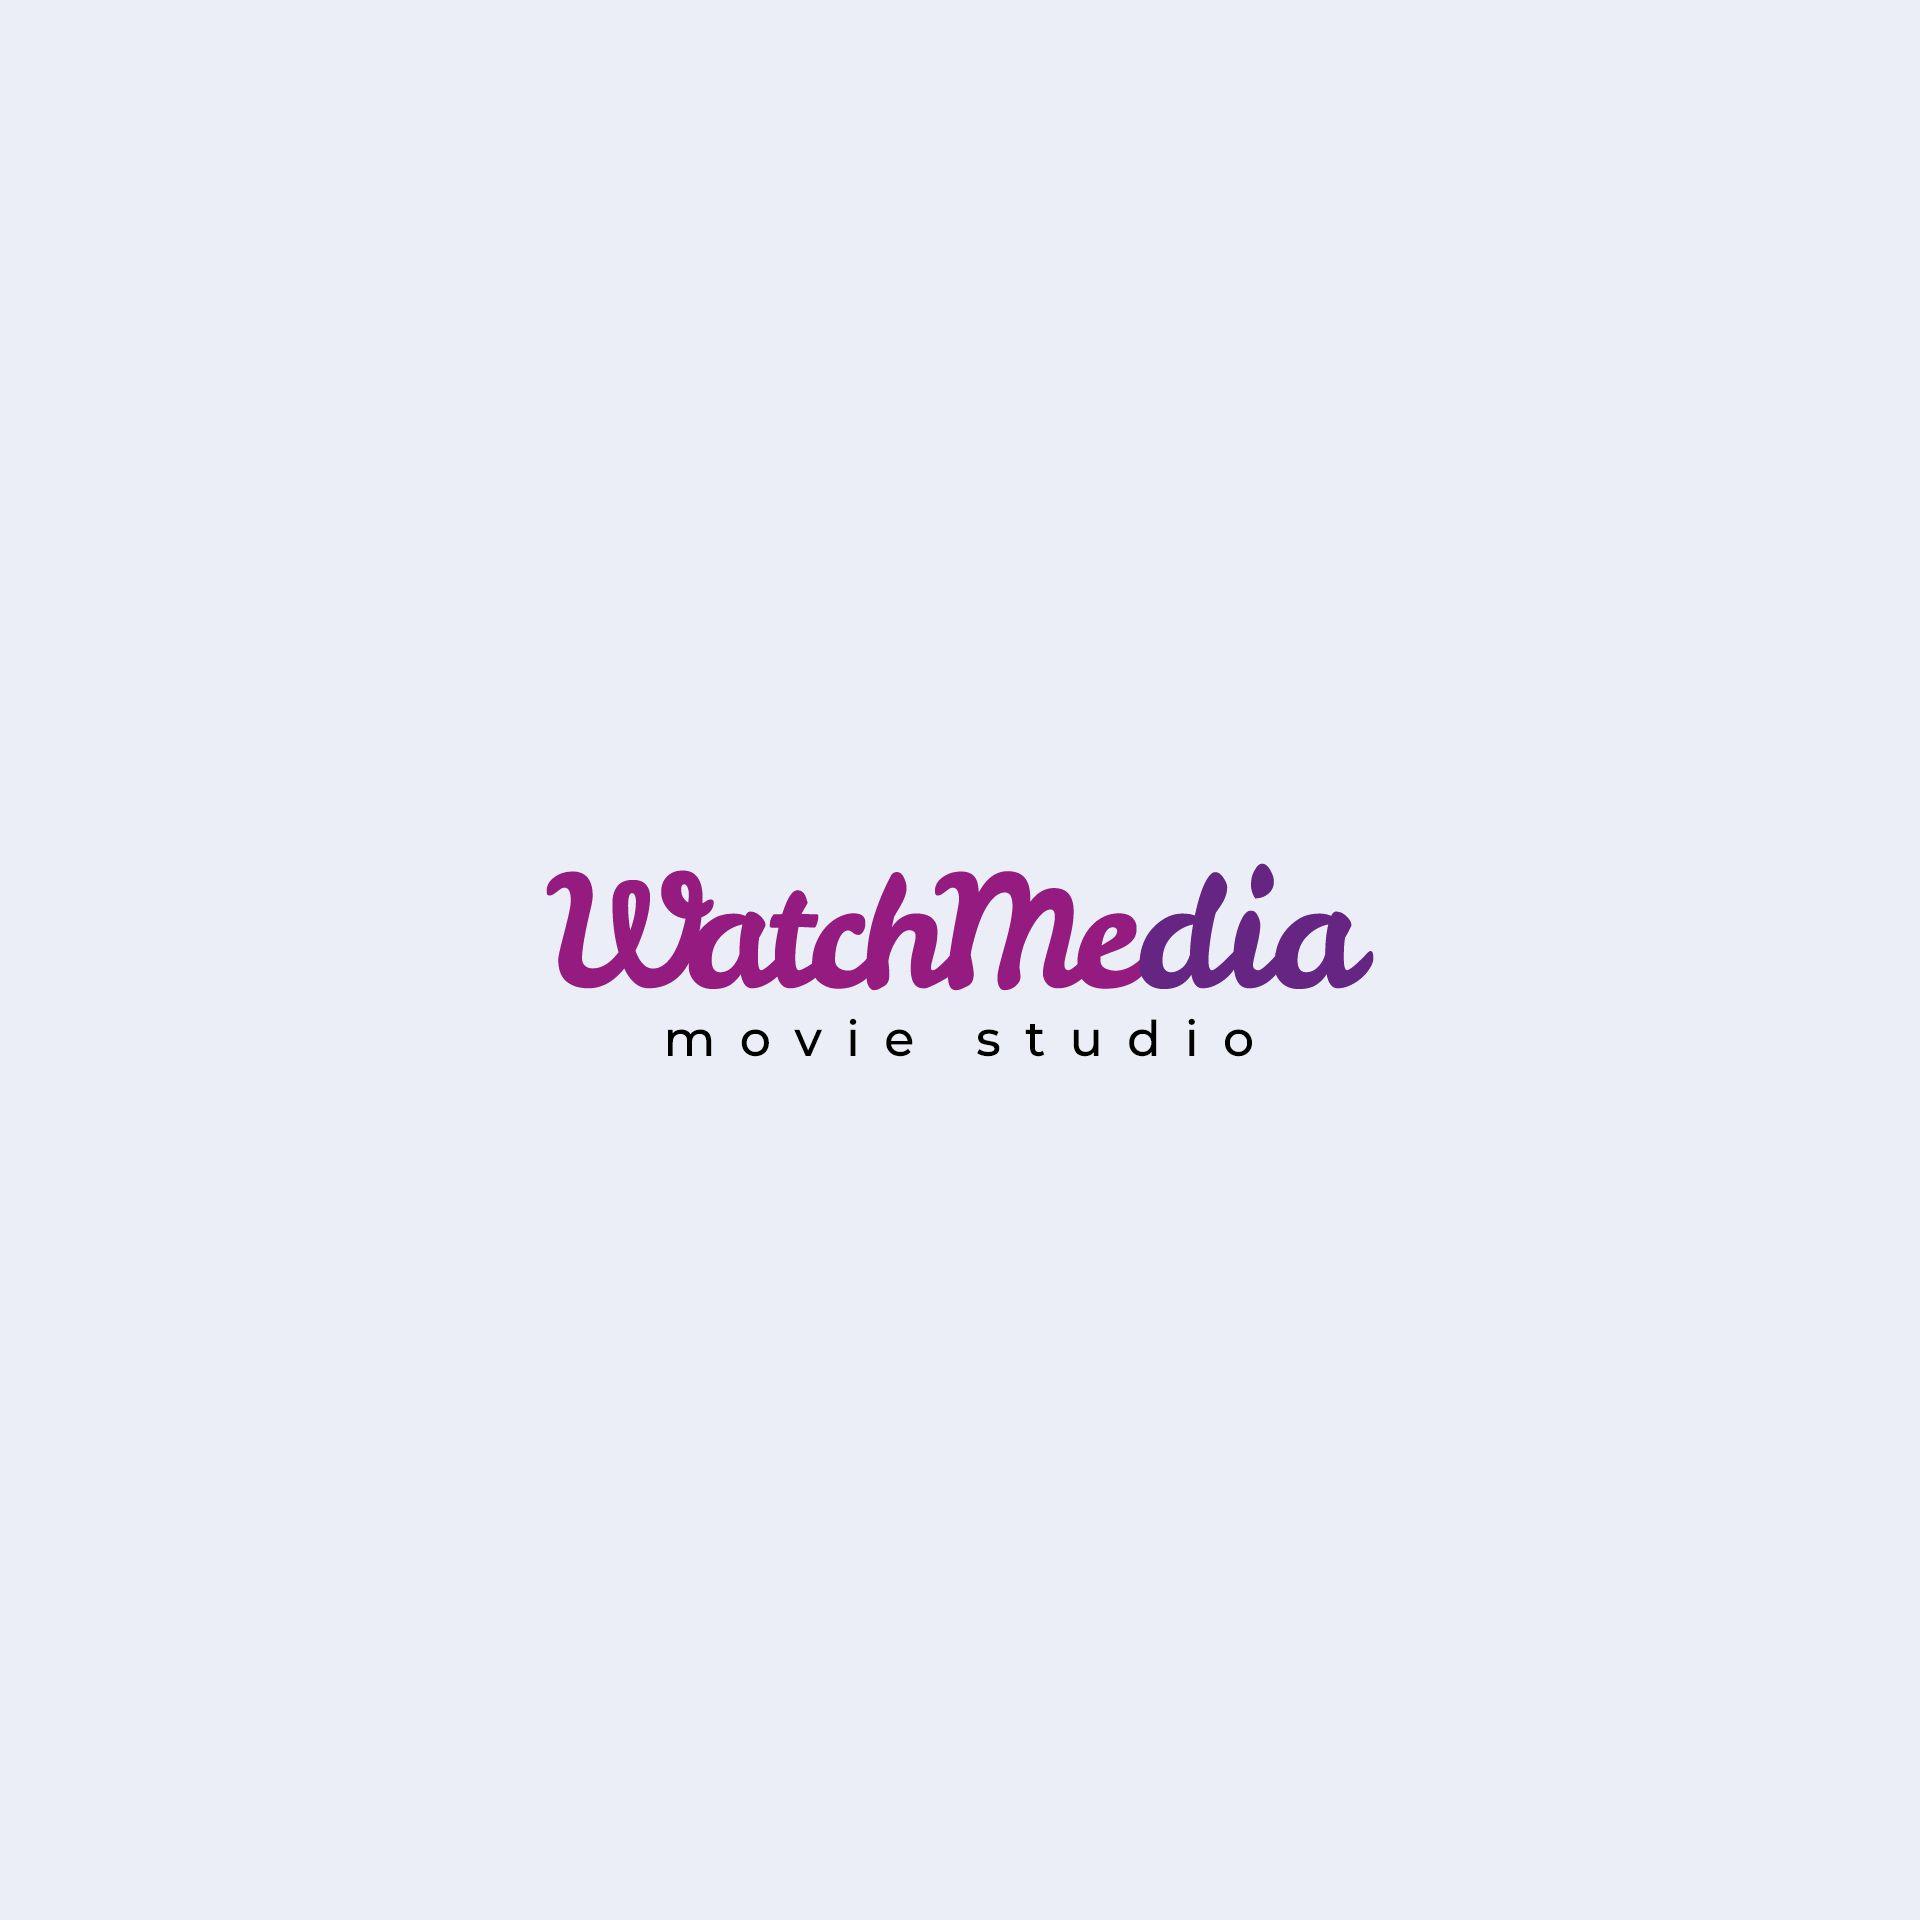 Логотип для WATCH MEdia - movie studio - дизайнер alpine-gold